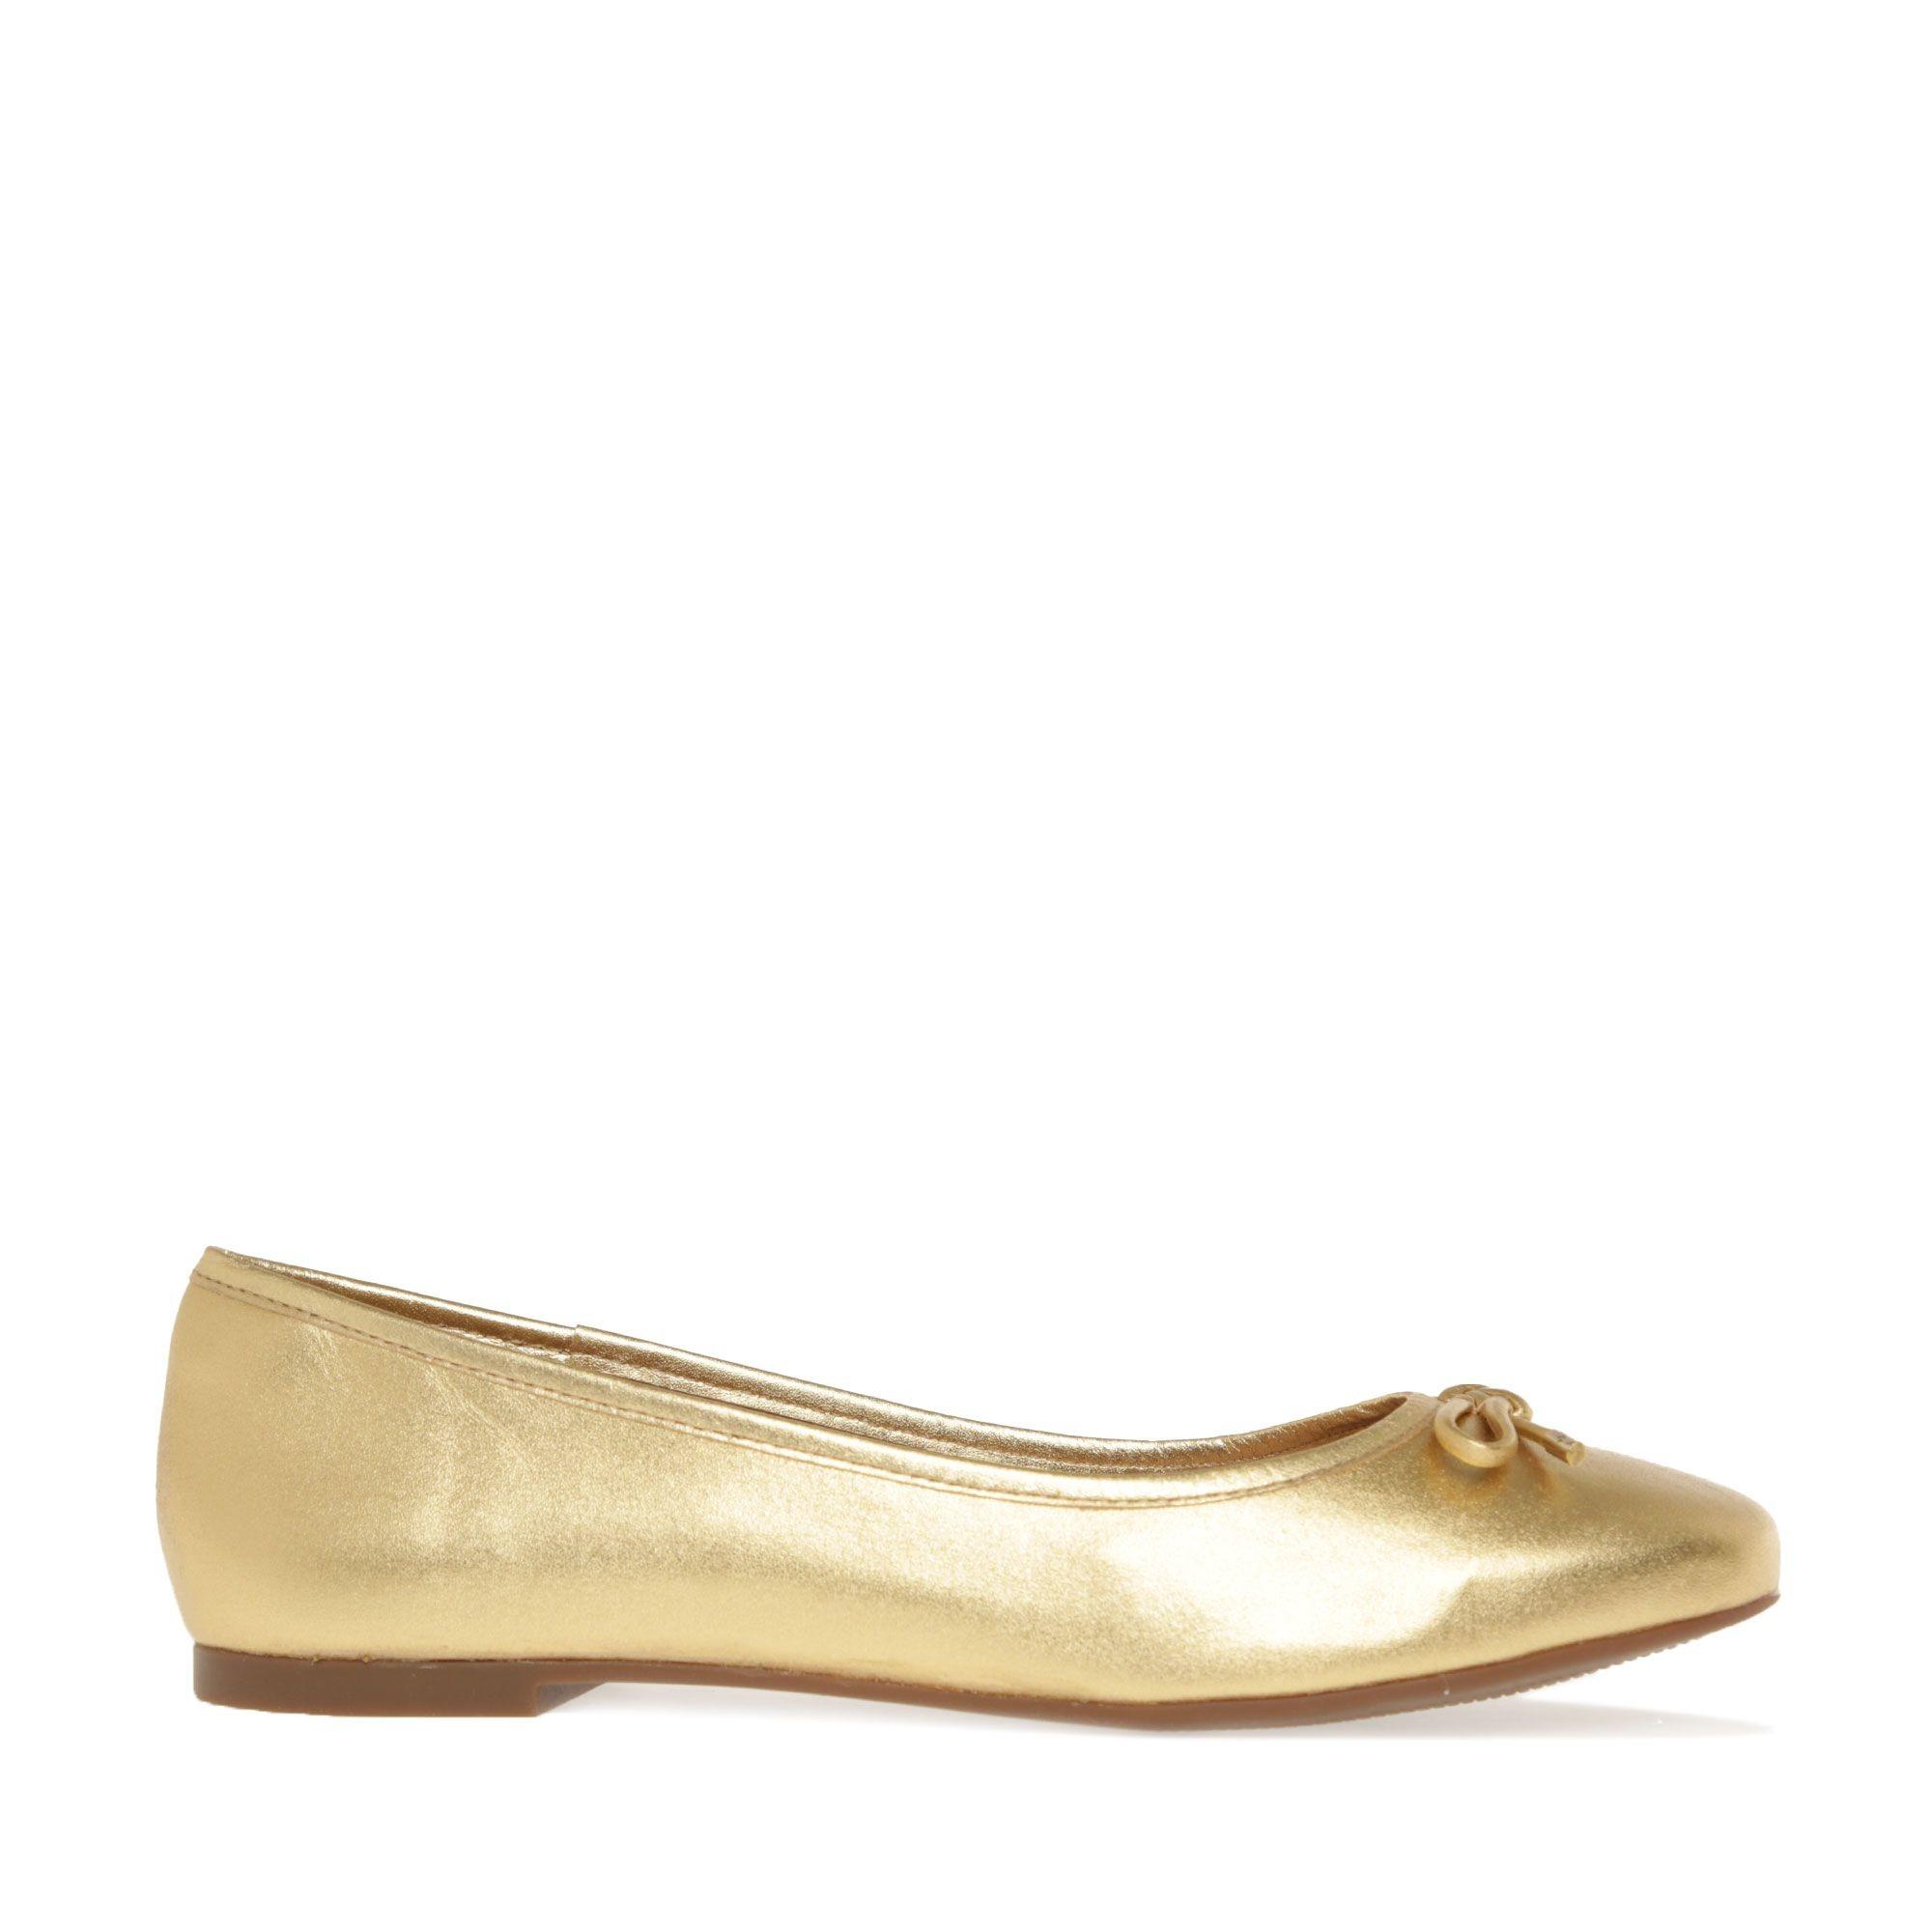 Sapatilha Lumina Dourada Tabita  - Lemis